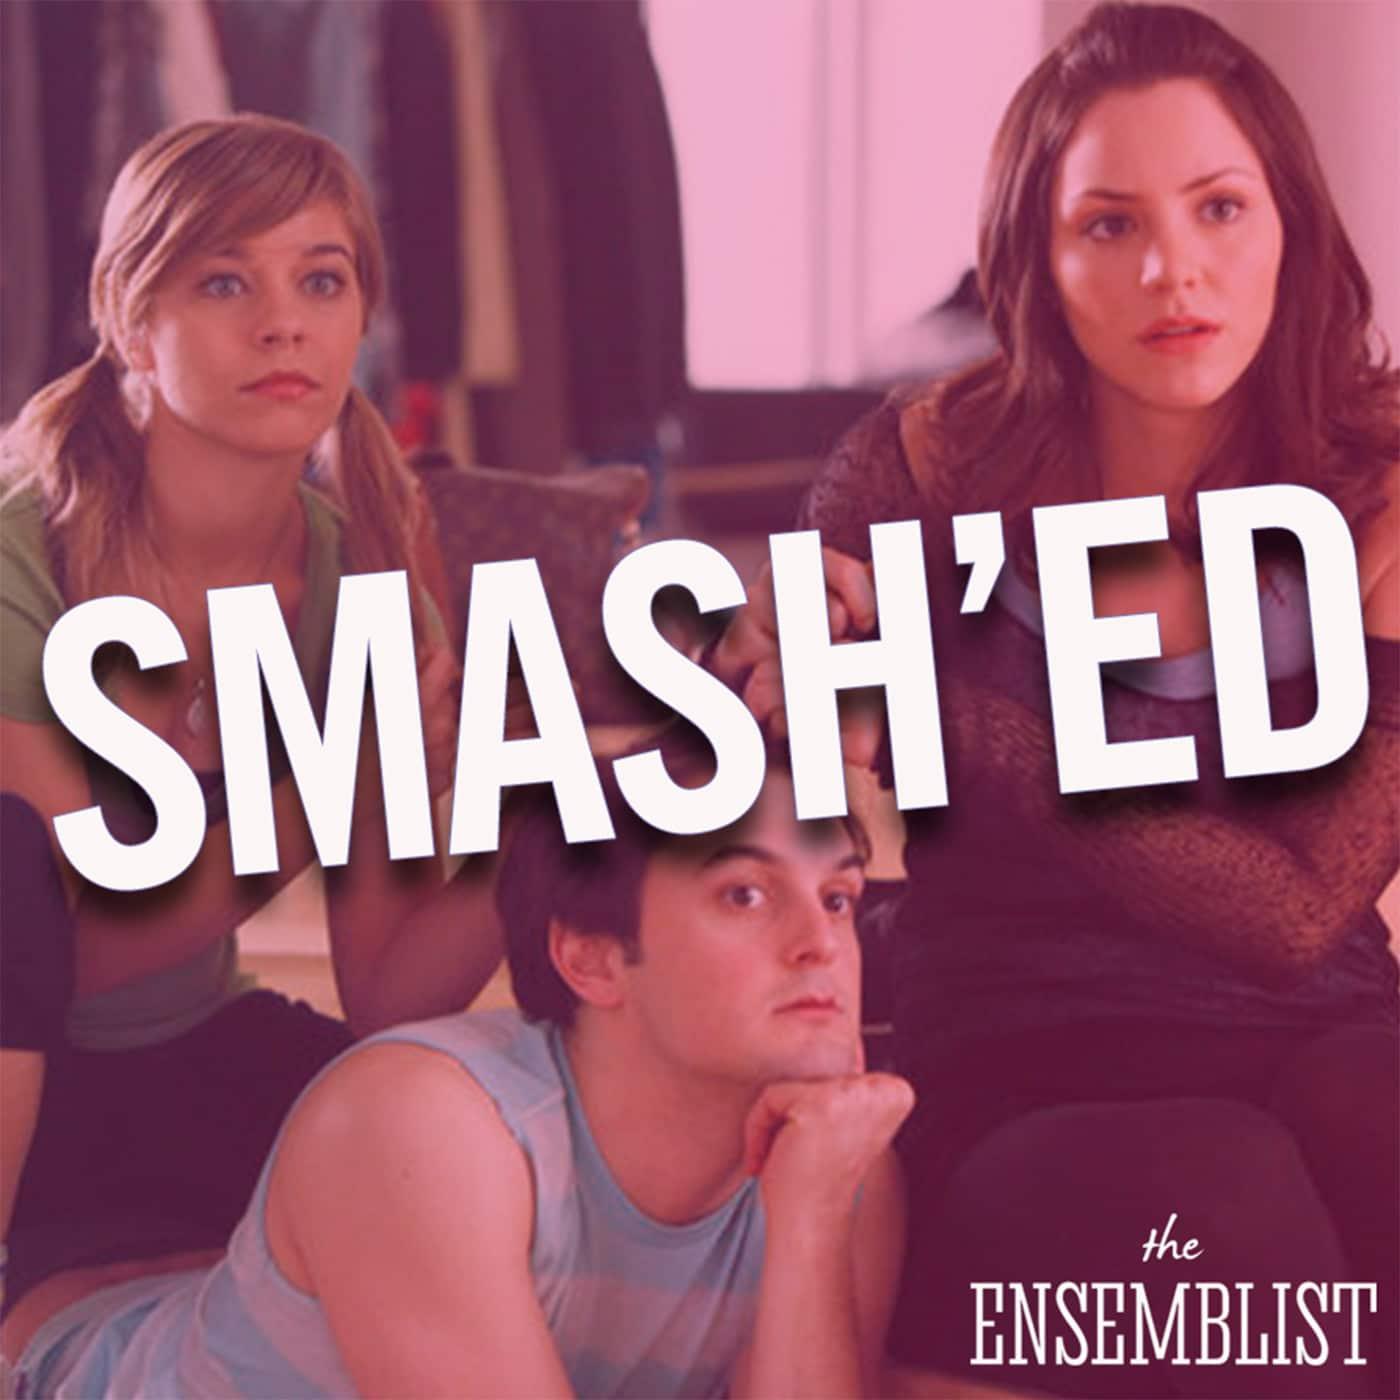 The Ensemblist host Mo Brady Episode 204 - Smash'ed (Episode 3)